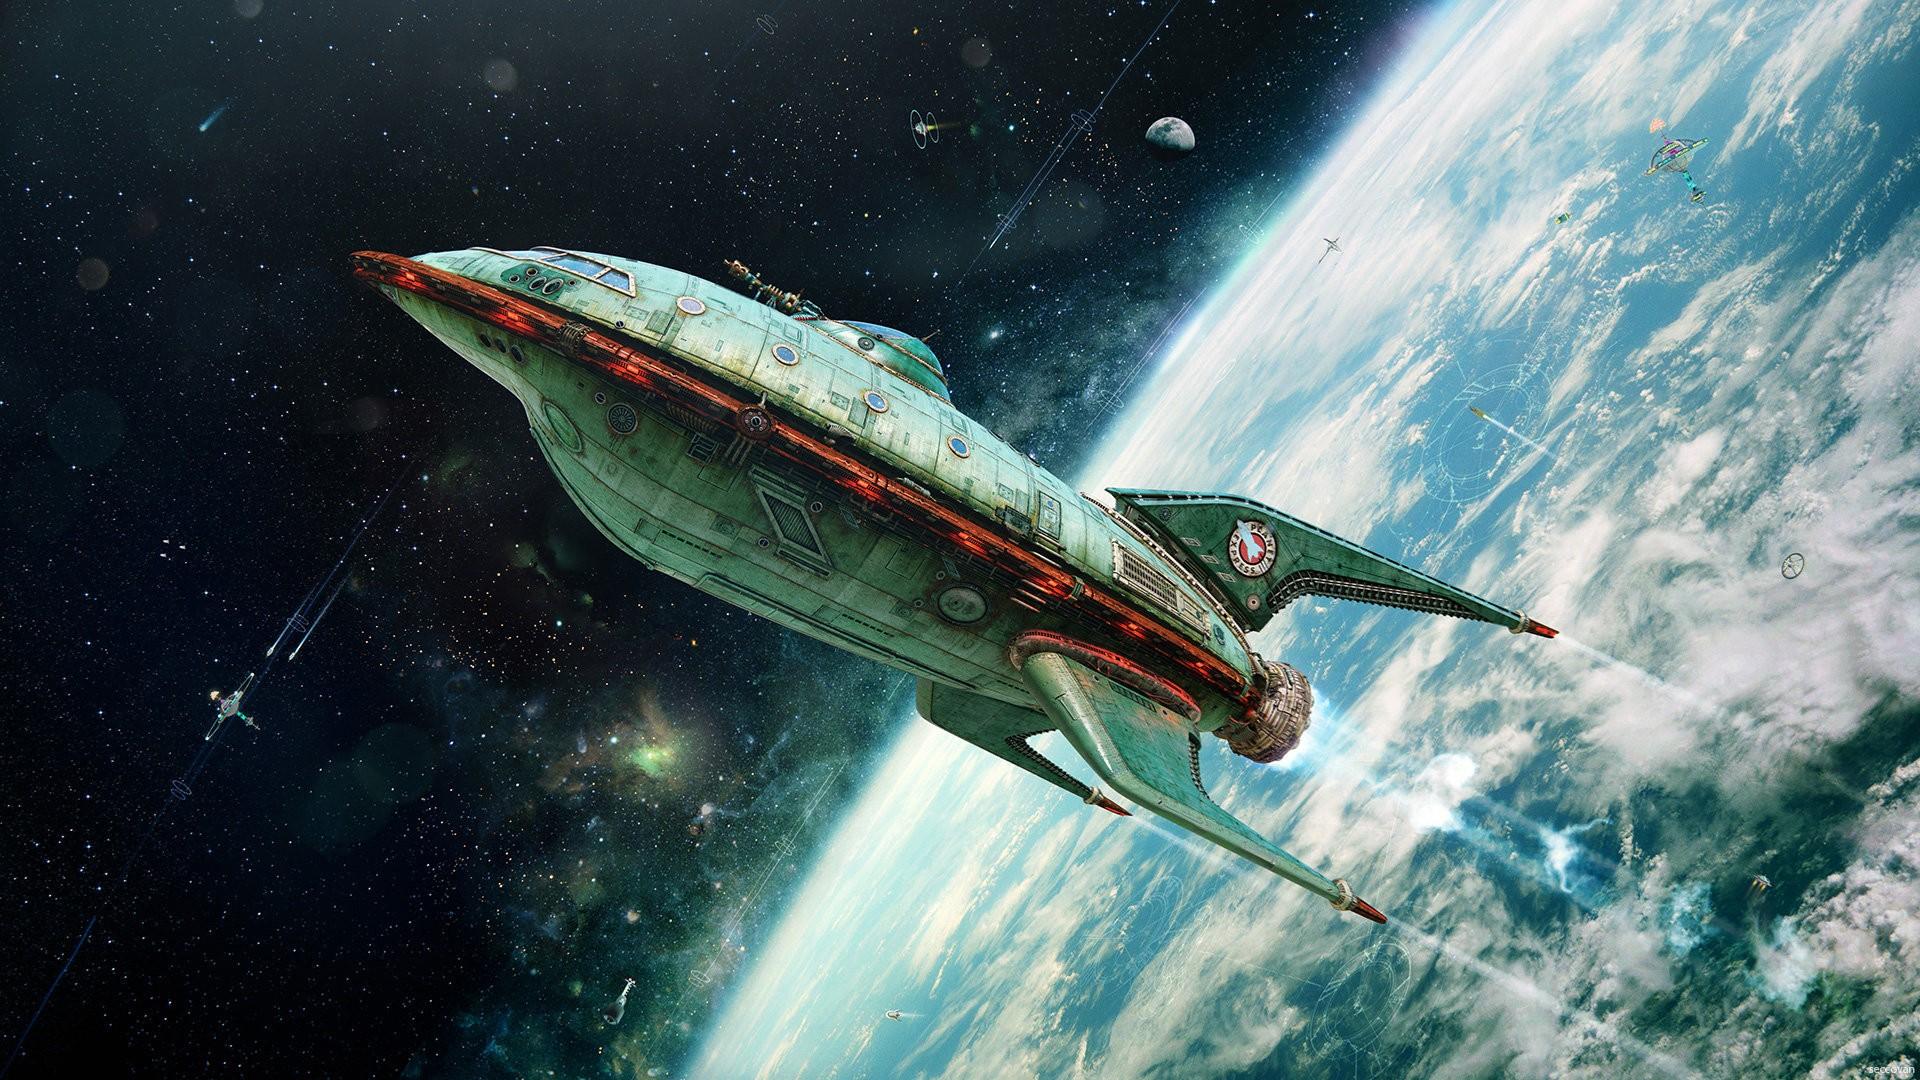 General 1920x1080 digital art space universe spaceship rocket planet Earth Futurama 3D vintage artwork satellite bokeh futuristic planet express realistic